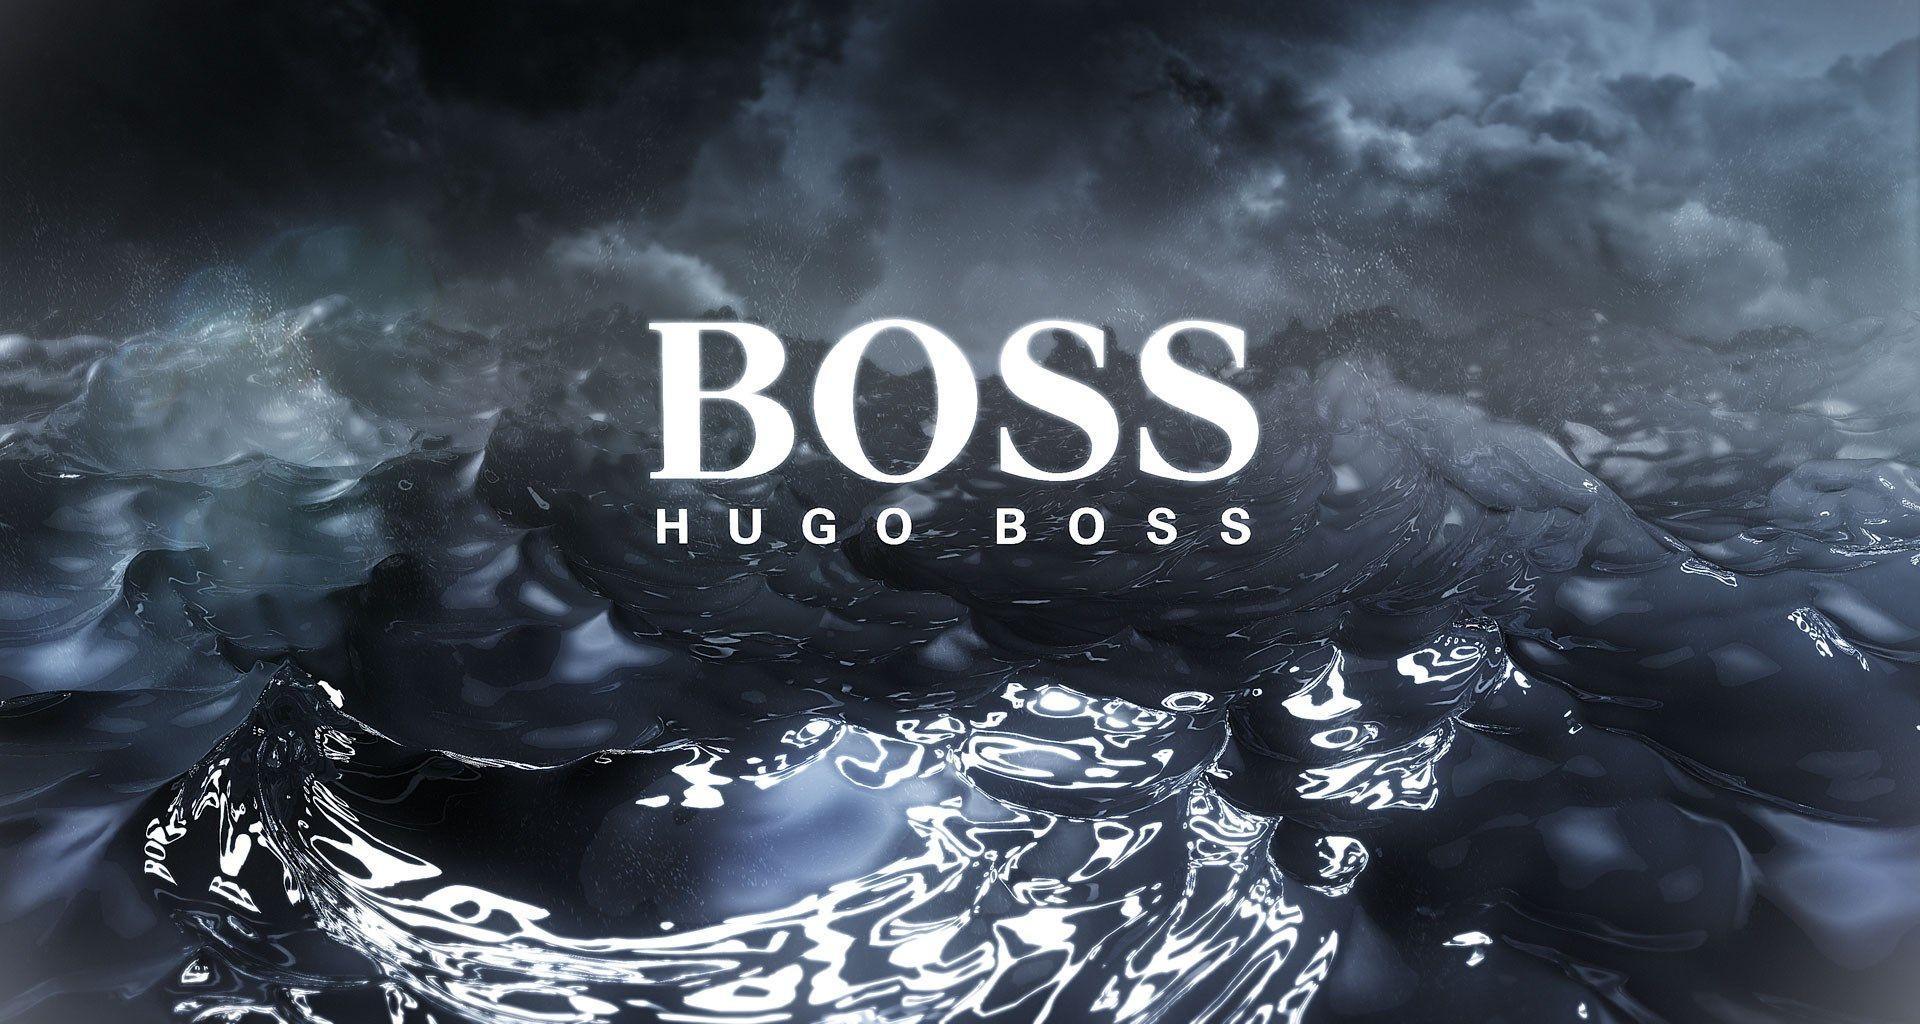 Hugo Boss Wallpapers Wallpaper Cave HD Wallpapers Download Free Images Wallpaper [1000image.com]